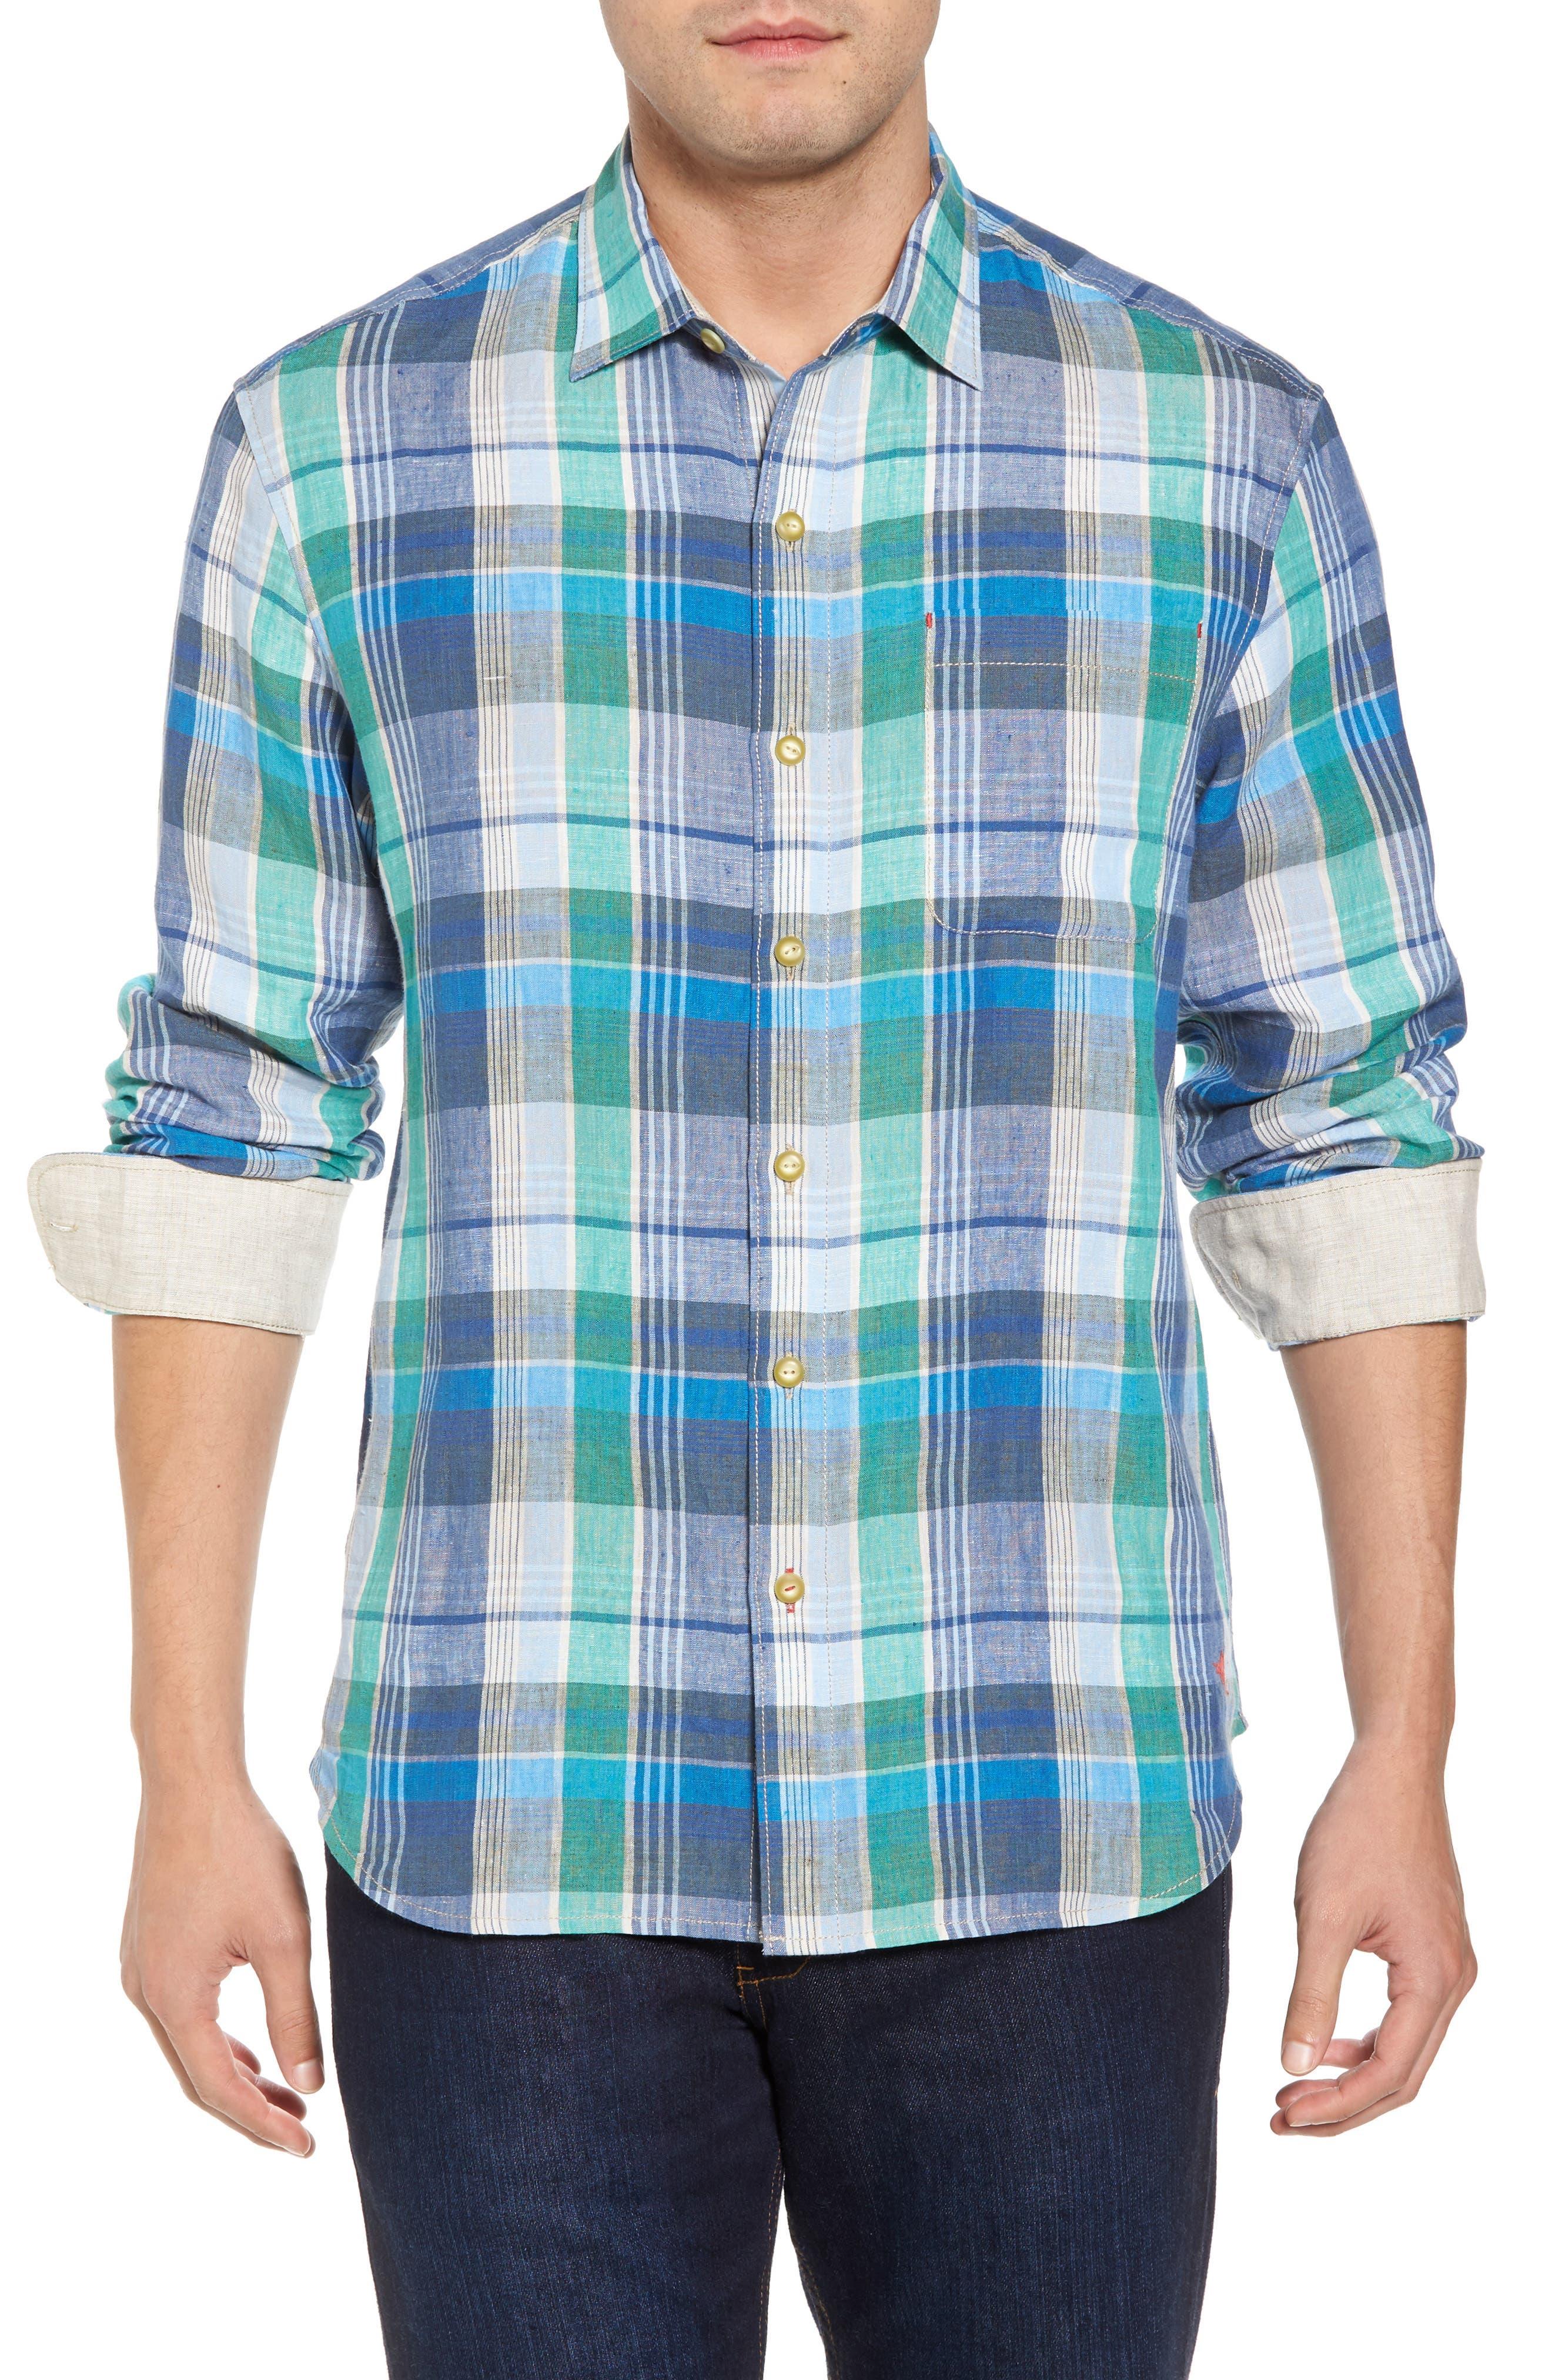 Vero Beach Madras Plaid Linen Sport Shirt,                         Main,                         color, Castaway Green